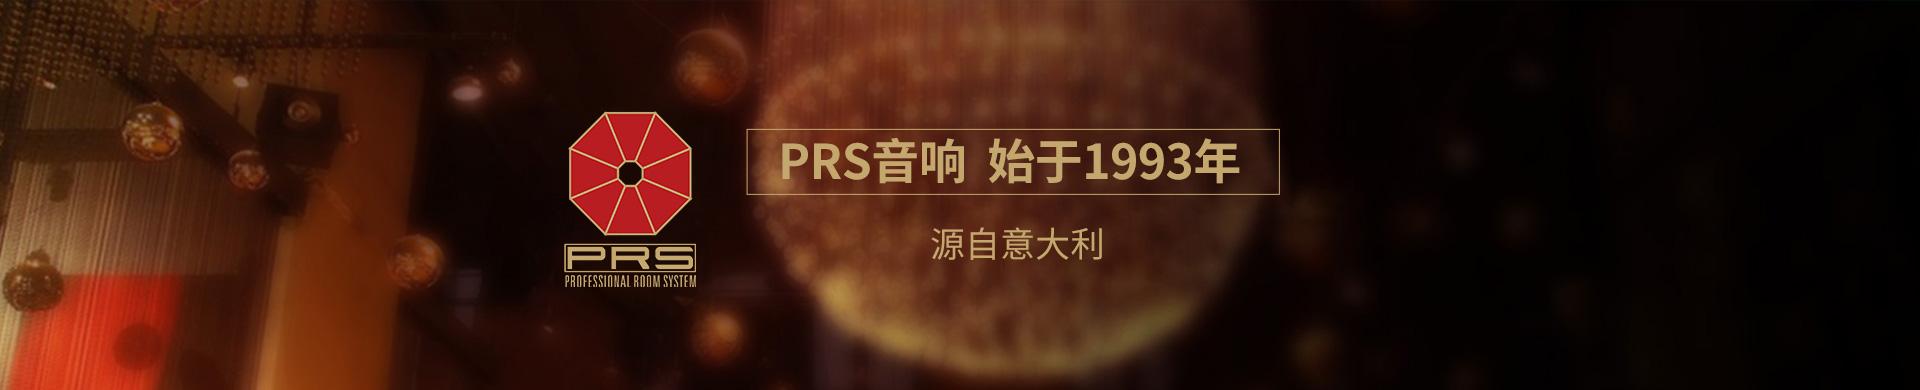 PRS音響